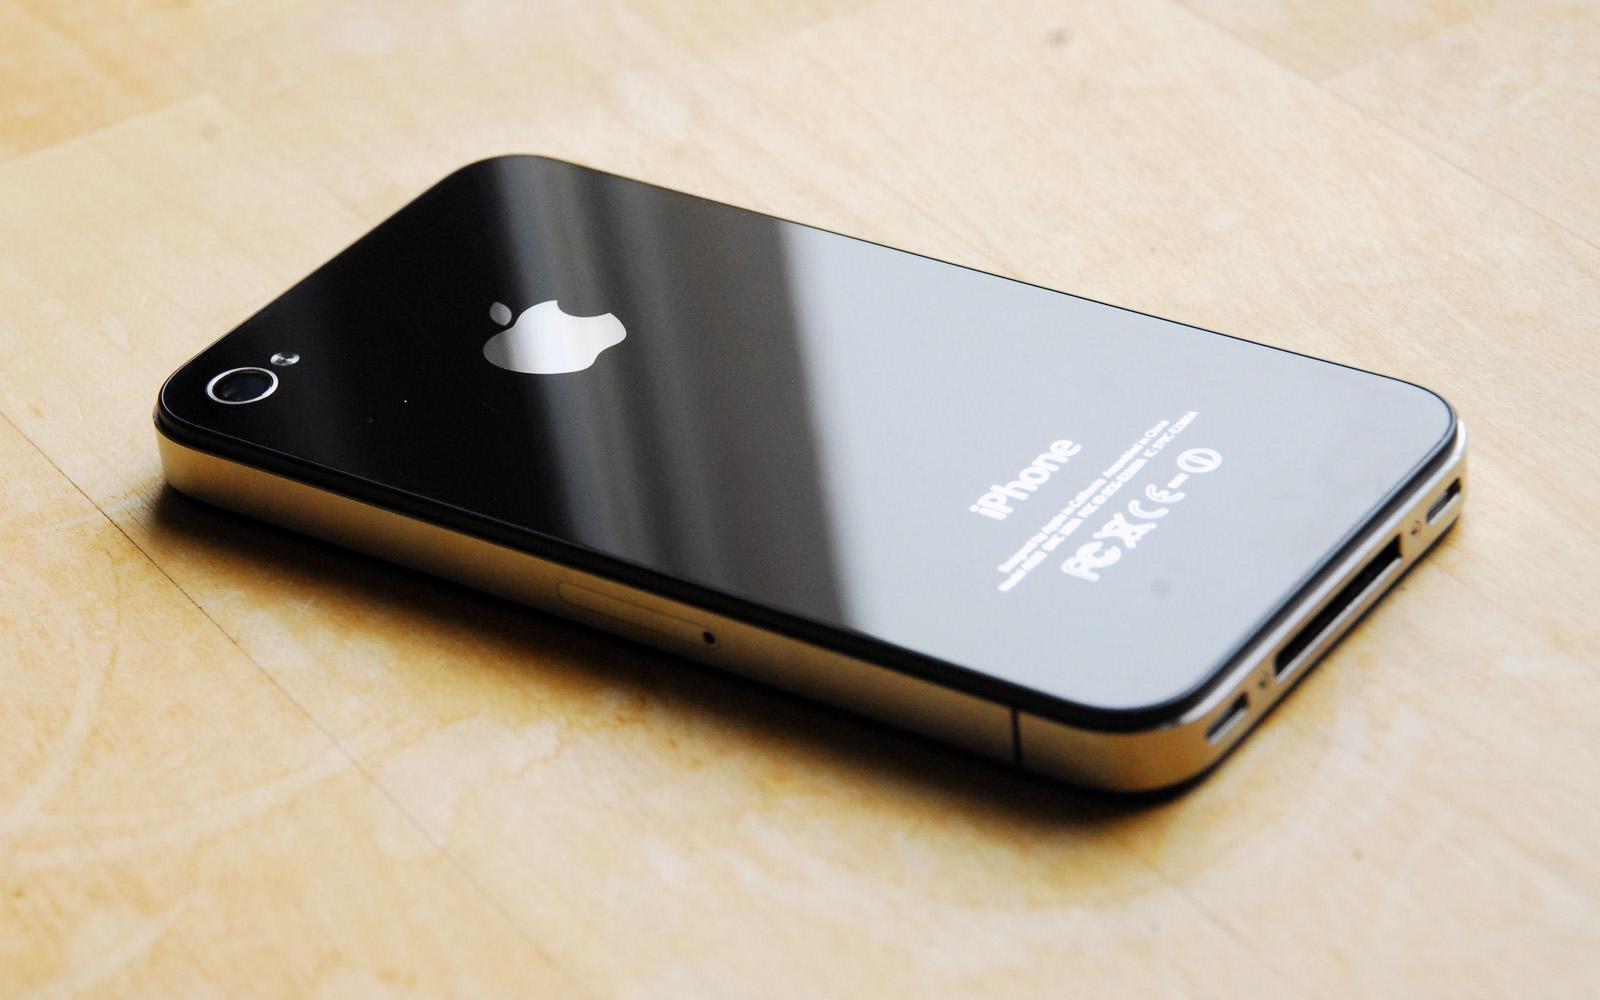 Cheaper iPhone 4 Photos Leaked [N90A]